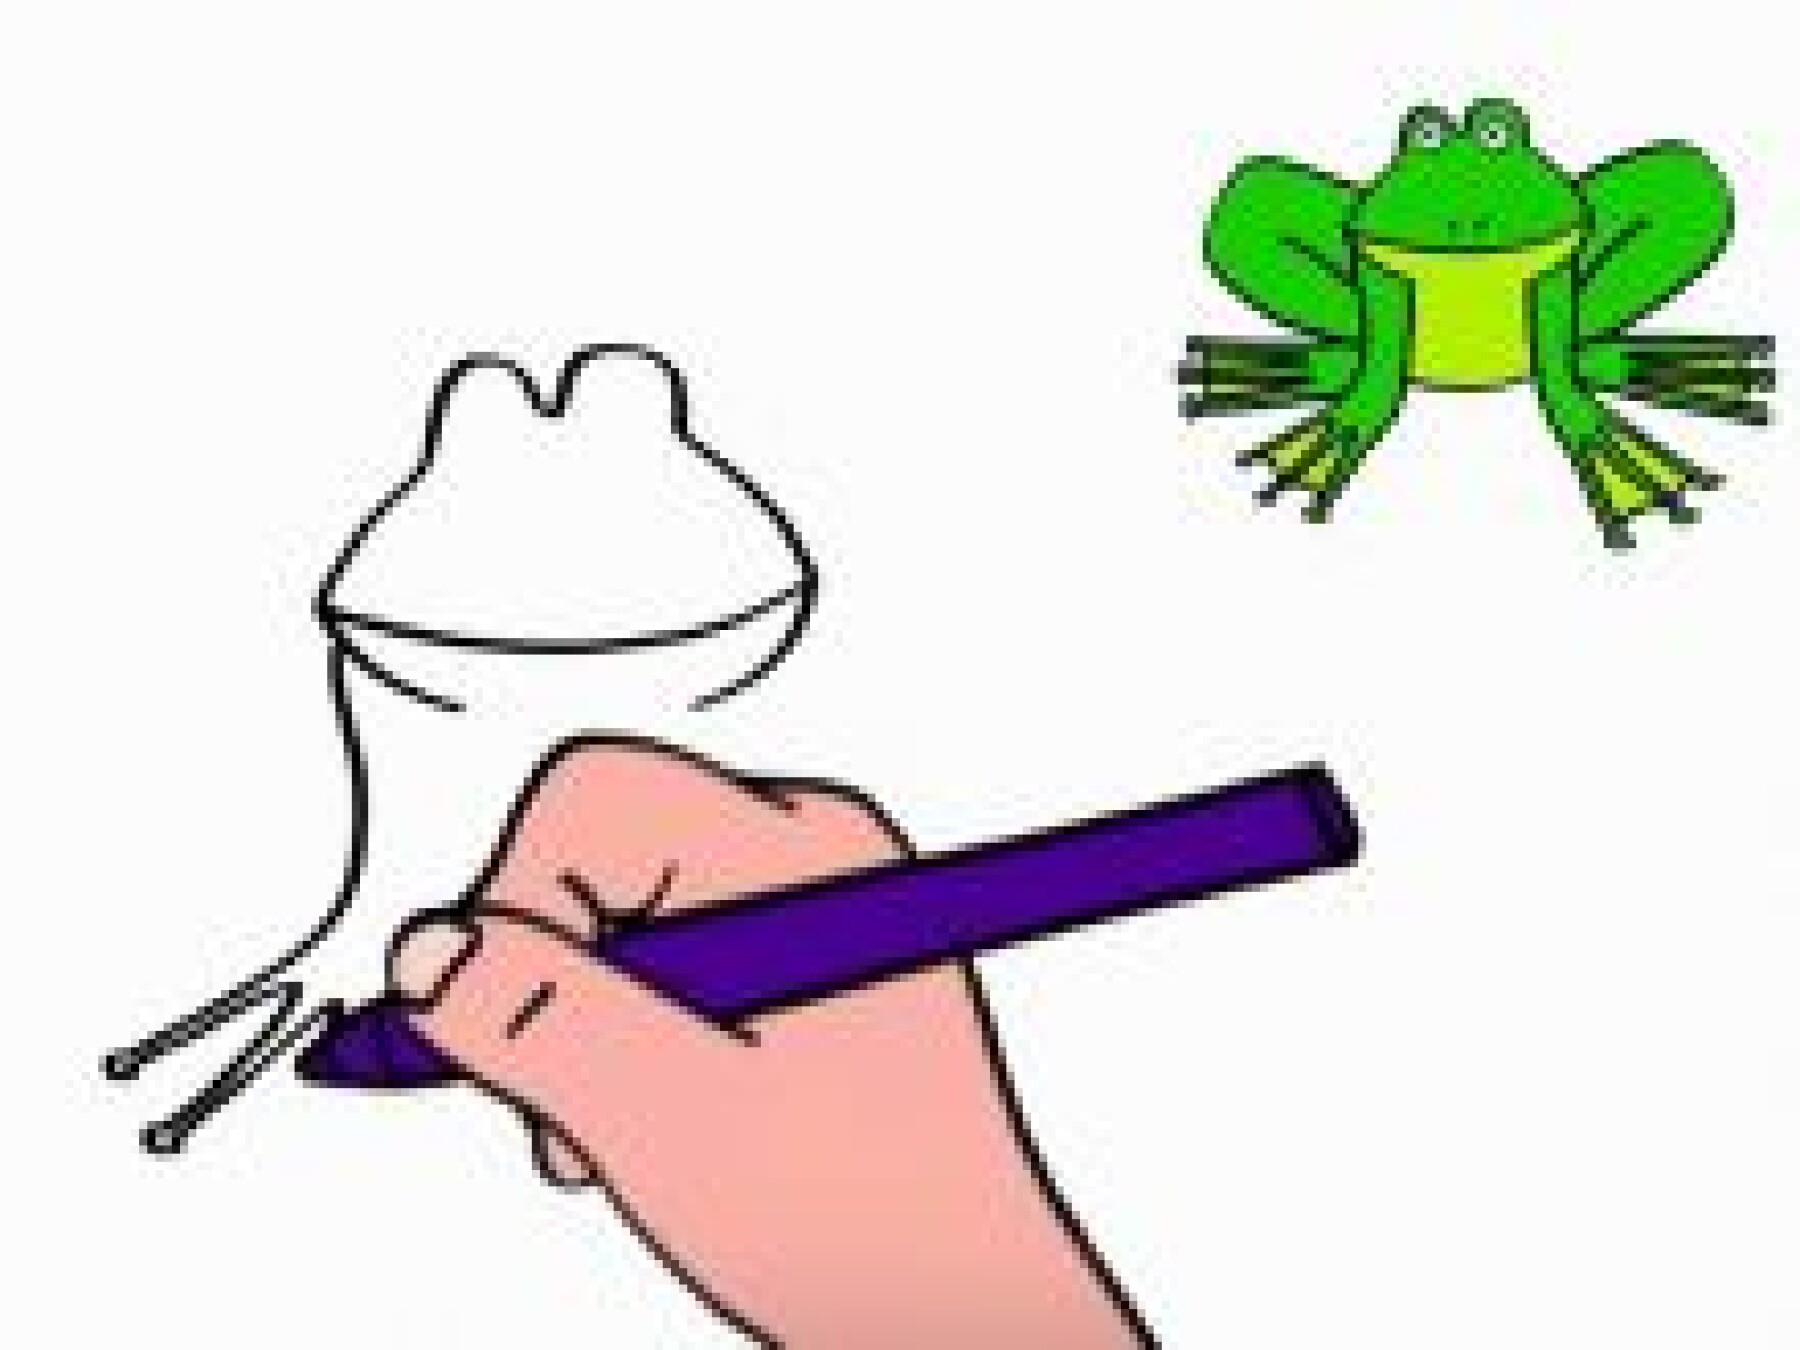 Dessiner une grenouille